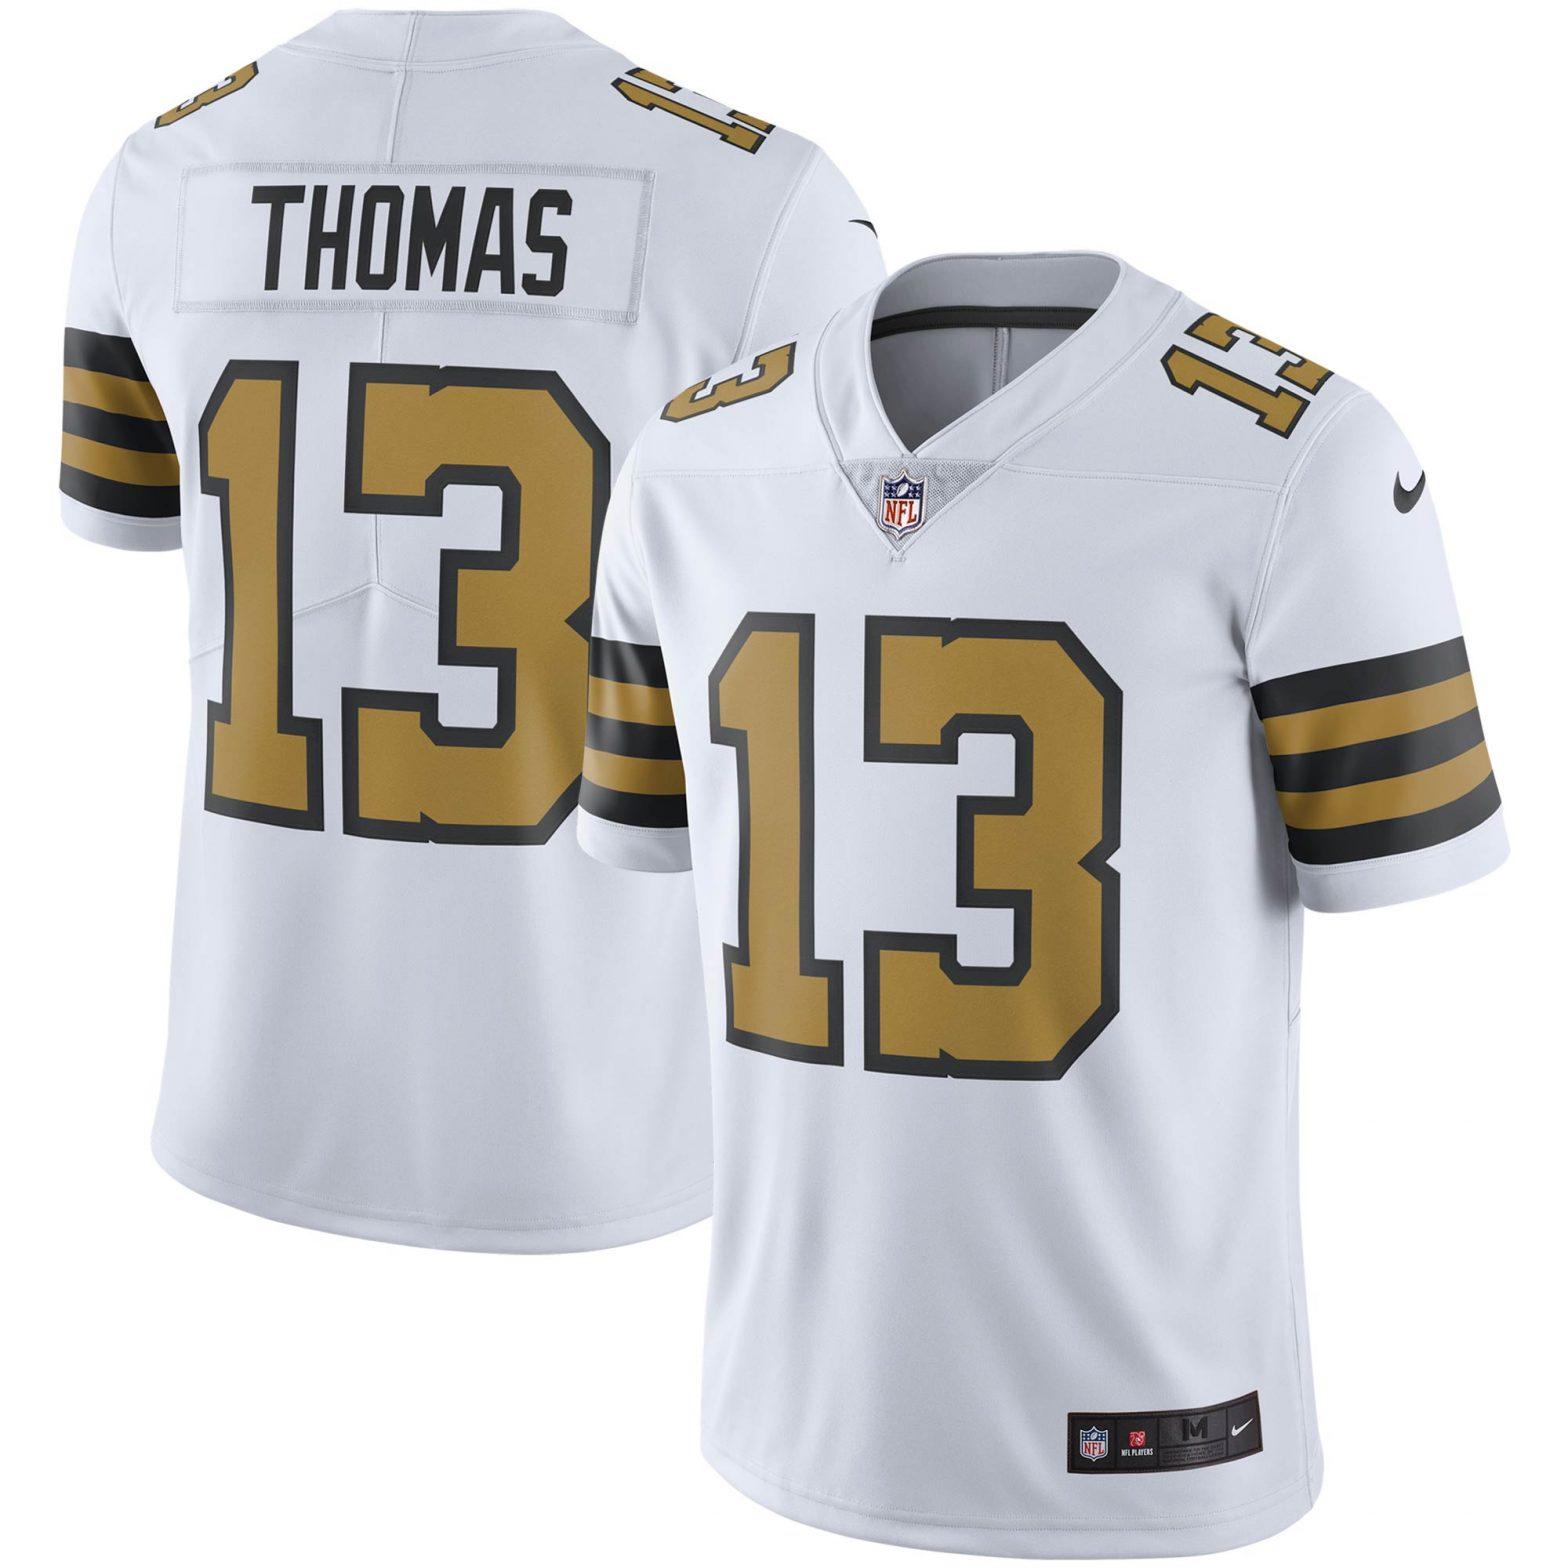 Cheap NFL Jerseys, Totally Save Up 50% Off! - Cheap NFL jerseys ...